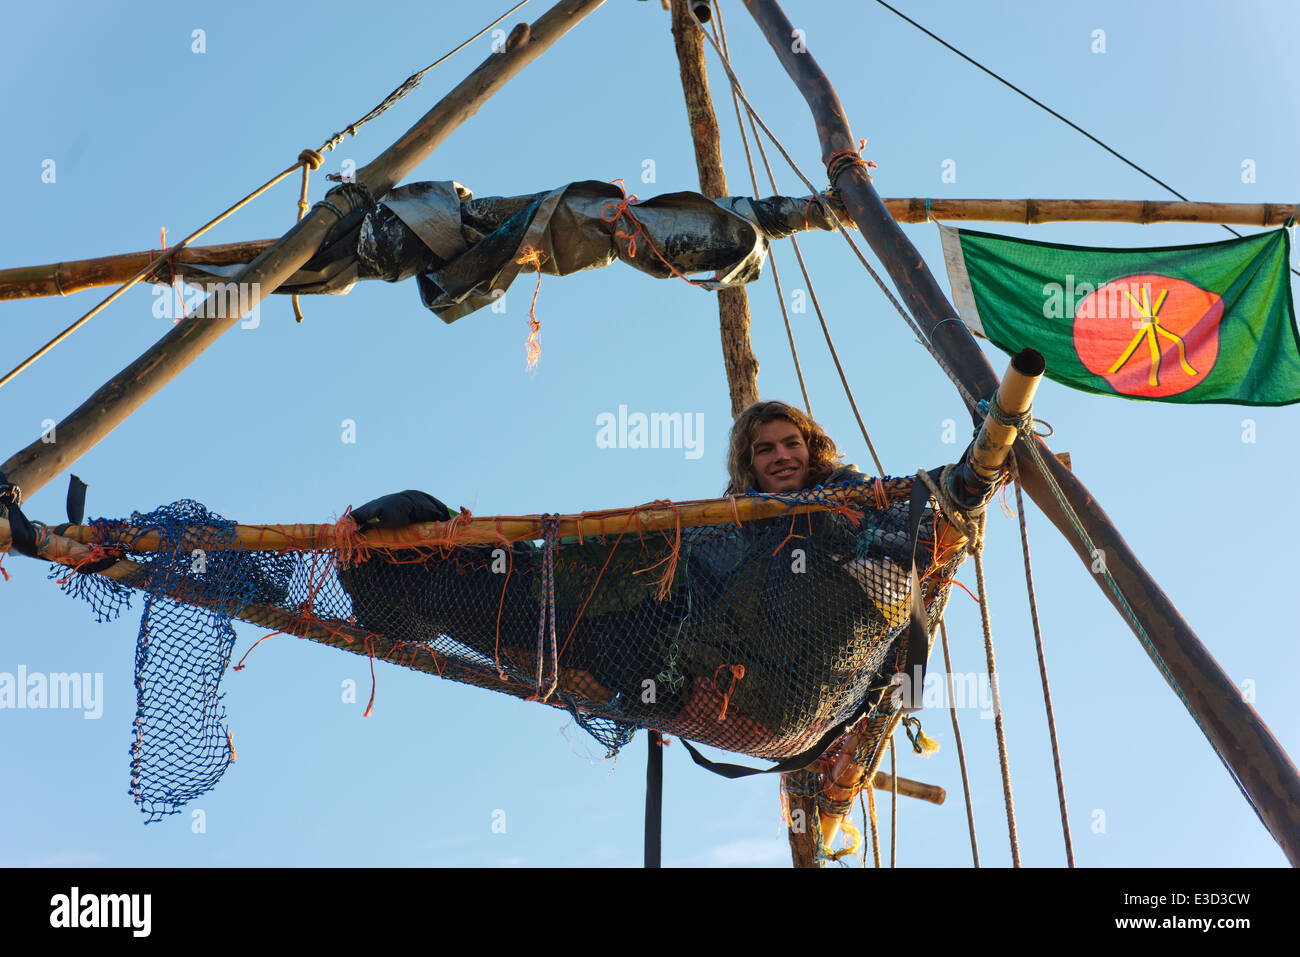 Protestor in a platform atop a tripod at the anti Coal Seam Gas blockade at Bentley. - Stock Image